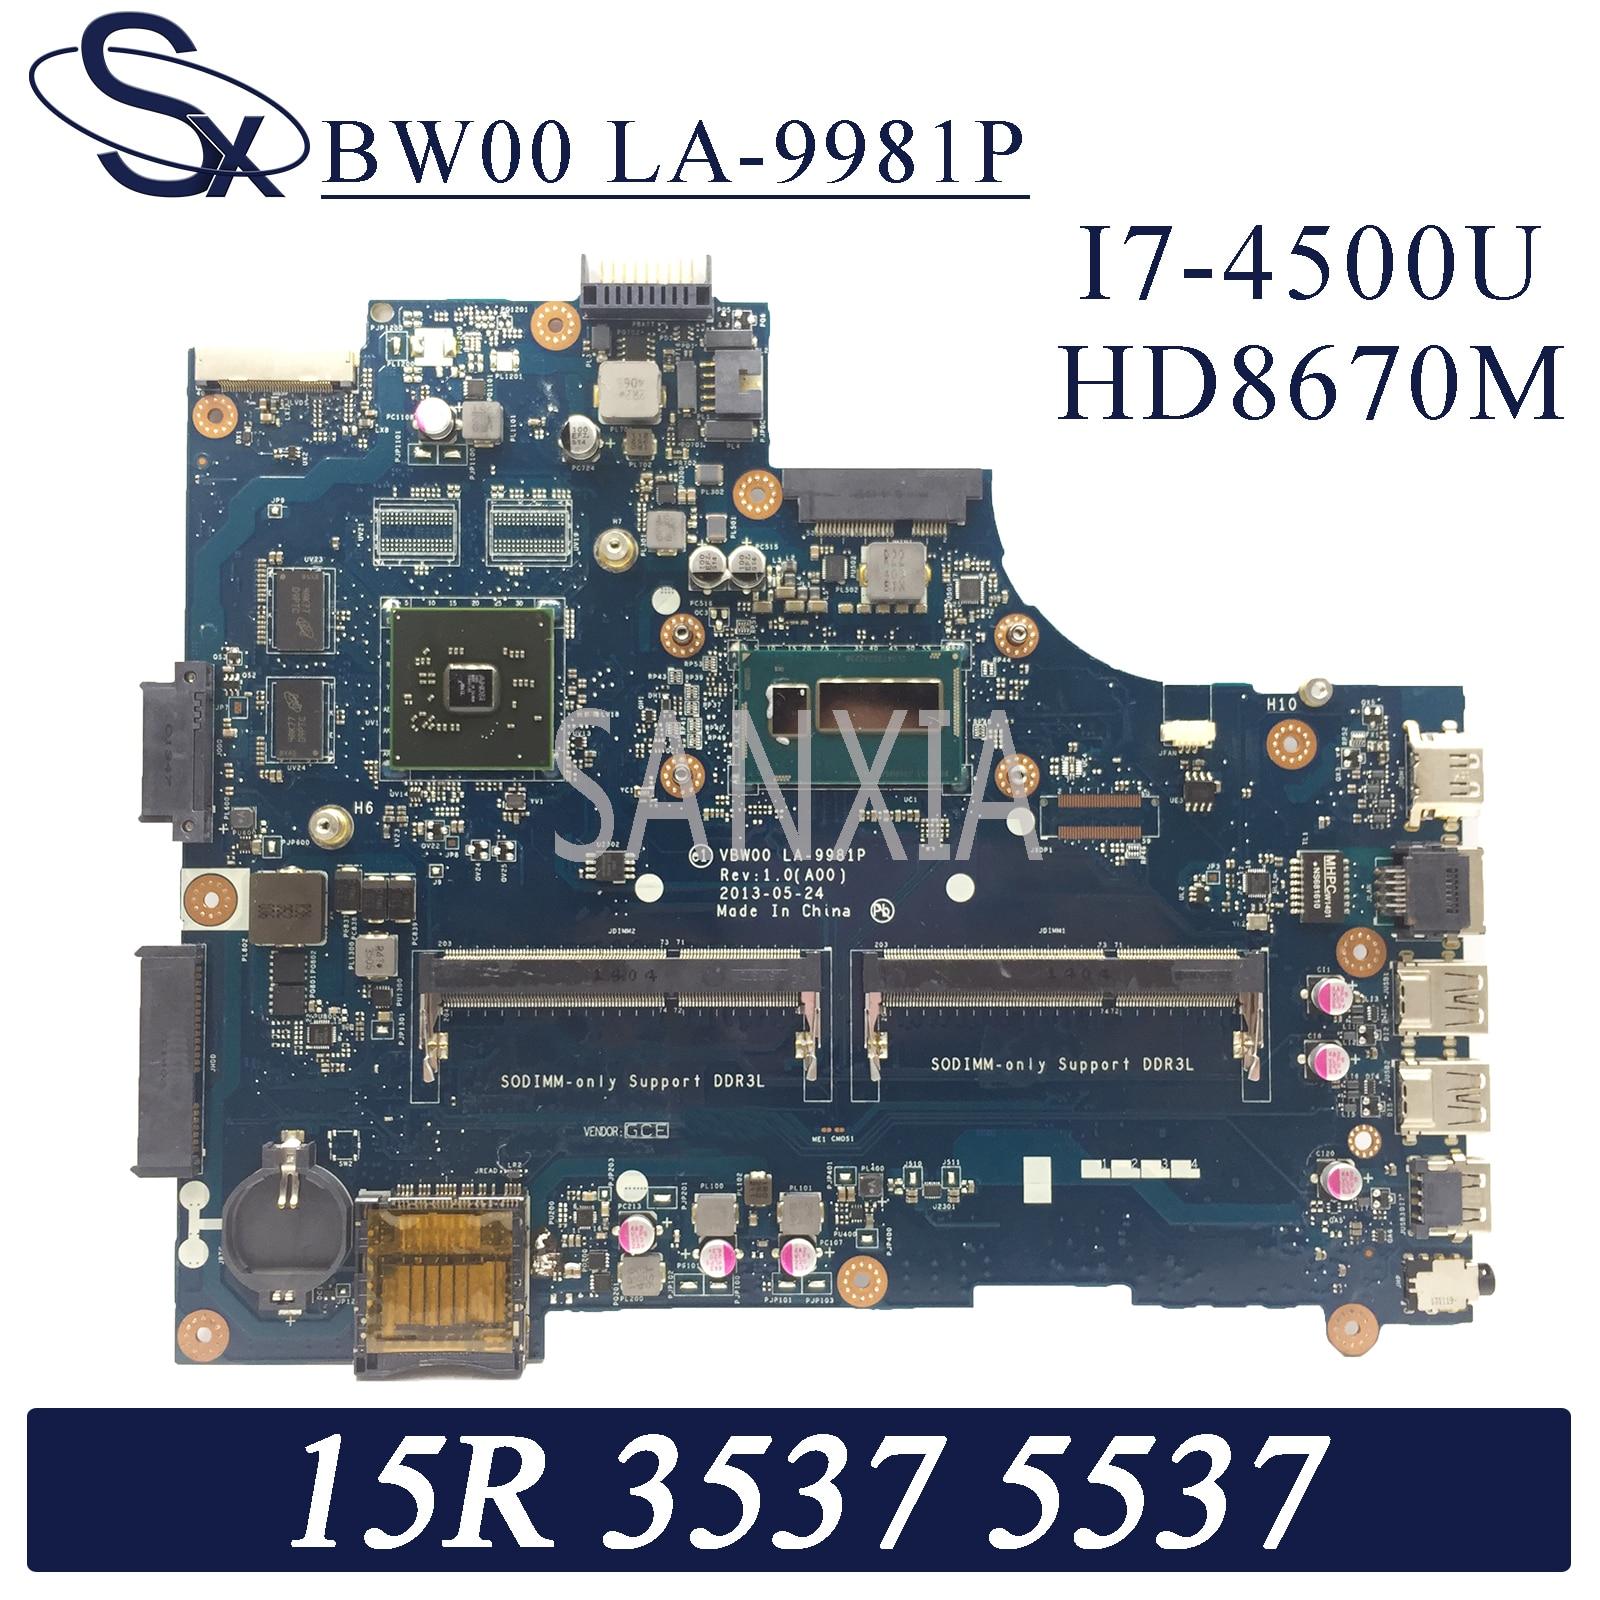 KEFU LA-9981P portátil placa base para Dell Inspiron 15R-3537 5537 placa base original de I7-4500U HD8670M